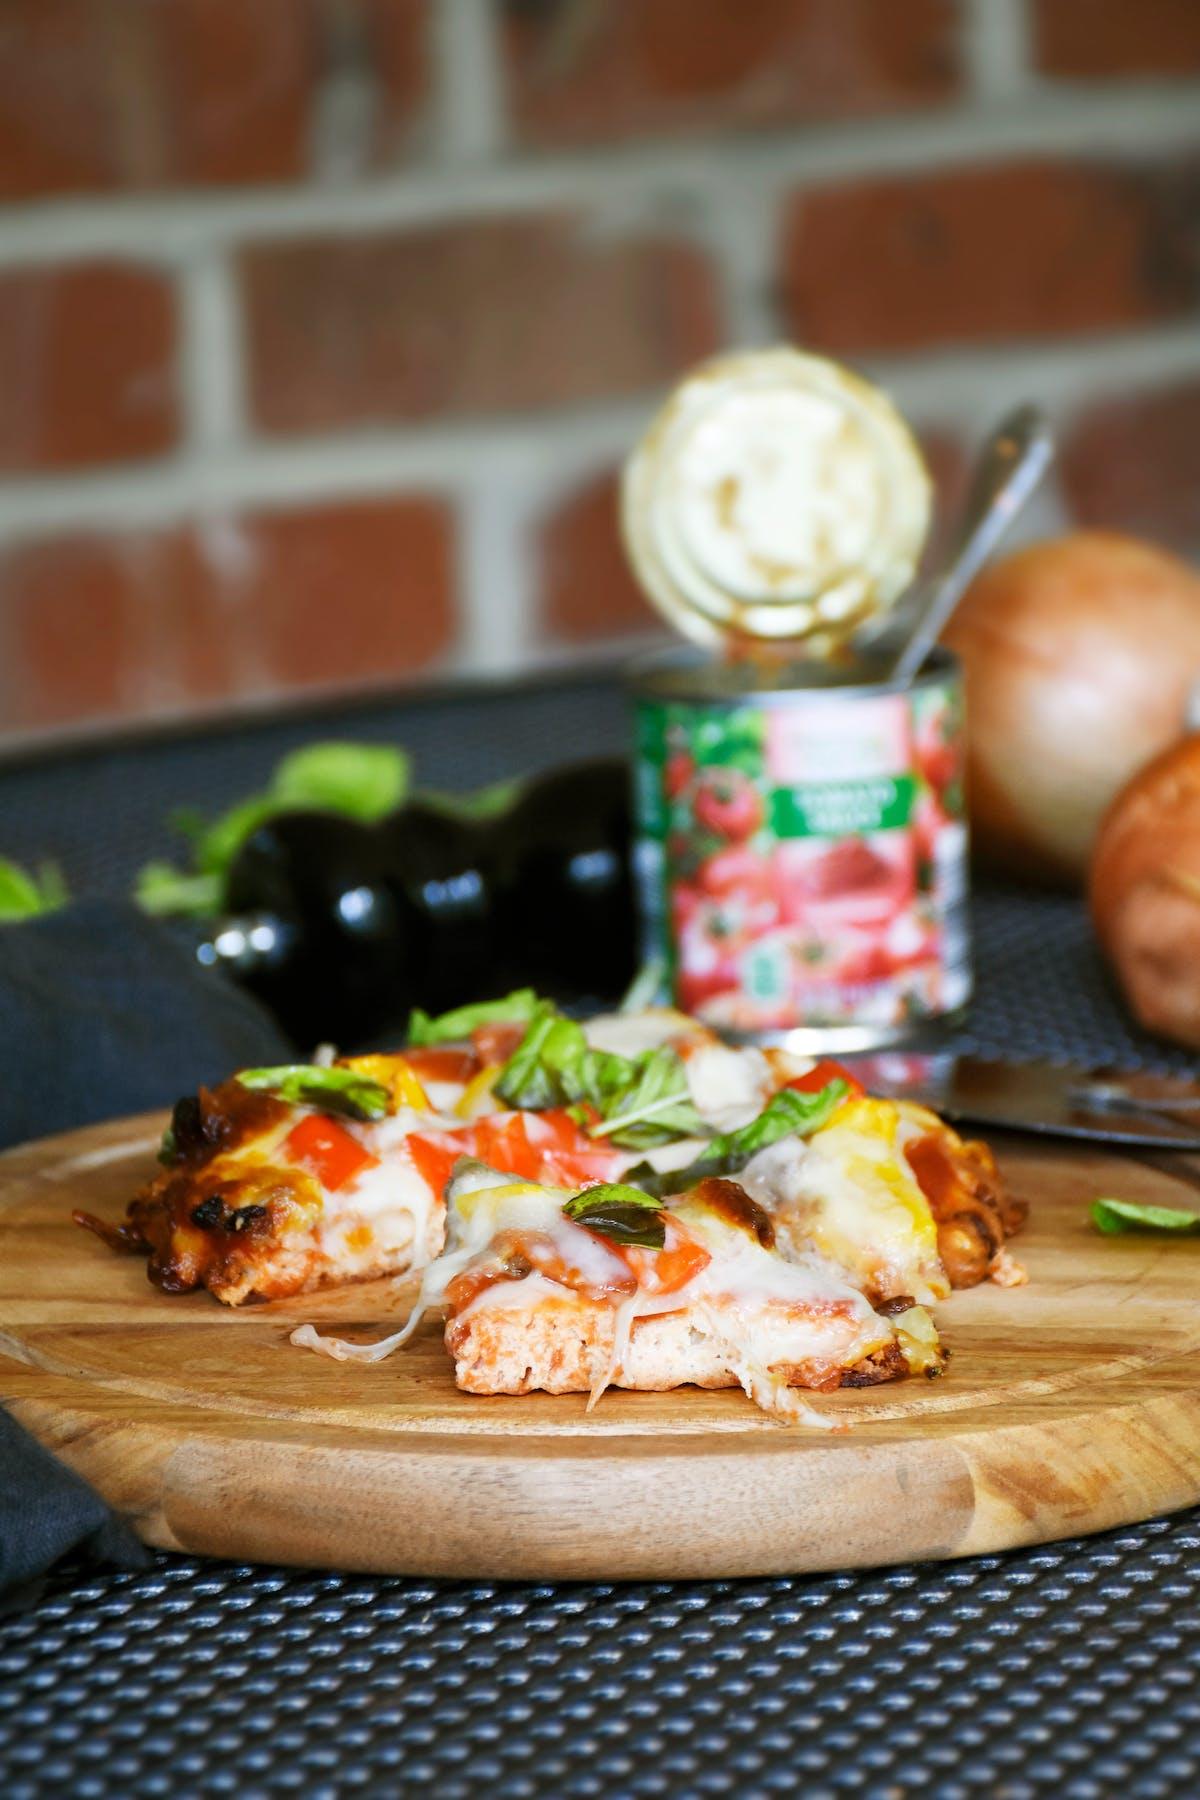 Sullivan's KeDough pizza